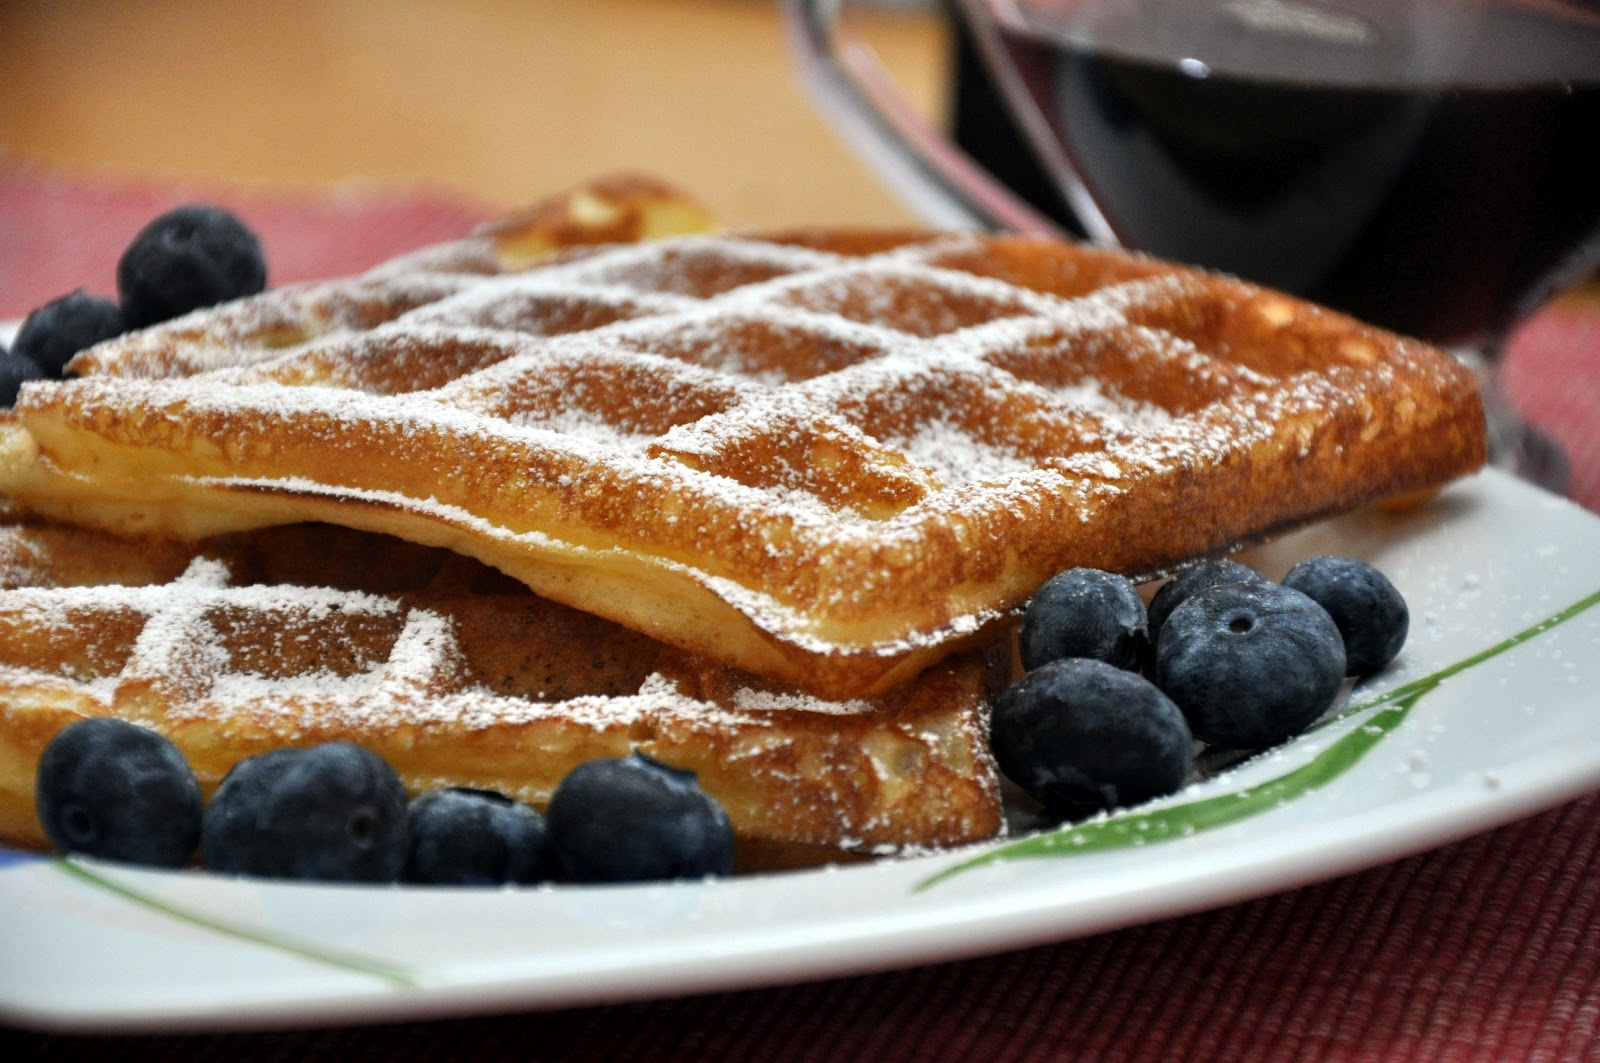 Waffles - Light & Crispy to the last bite! | Jyotsna's World